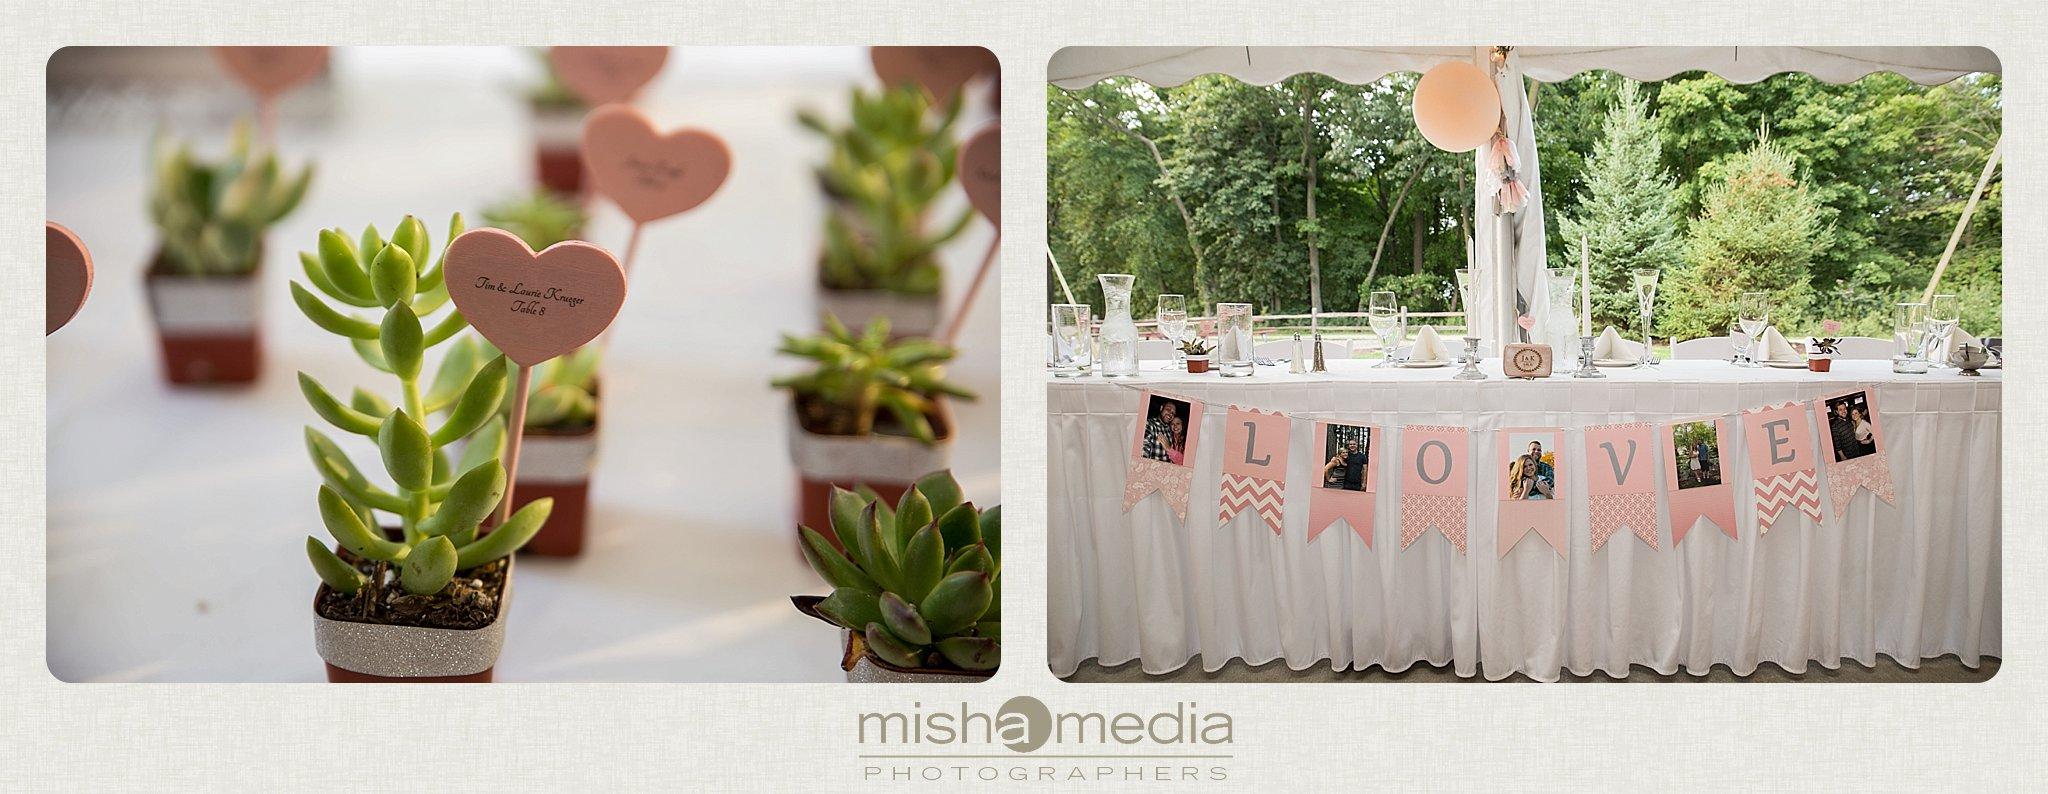 Weddings at Chestnut mountain Resort_0020